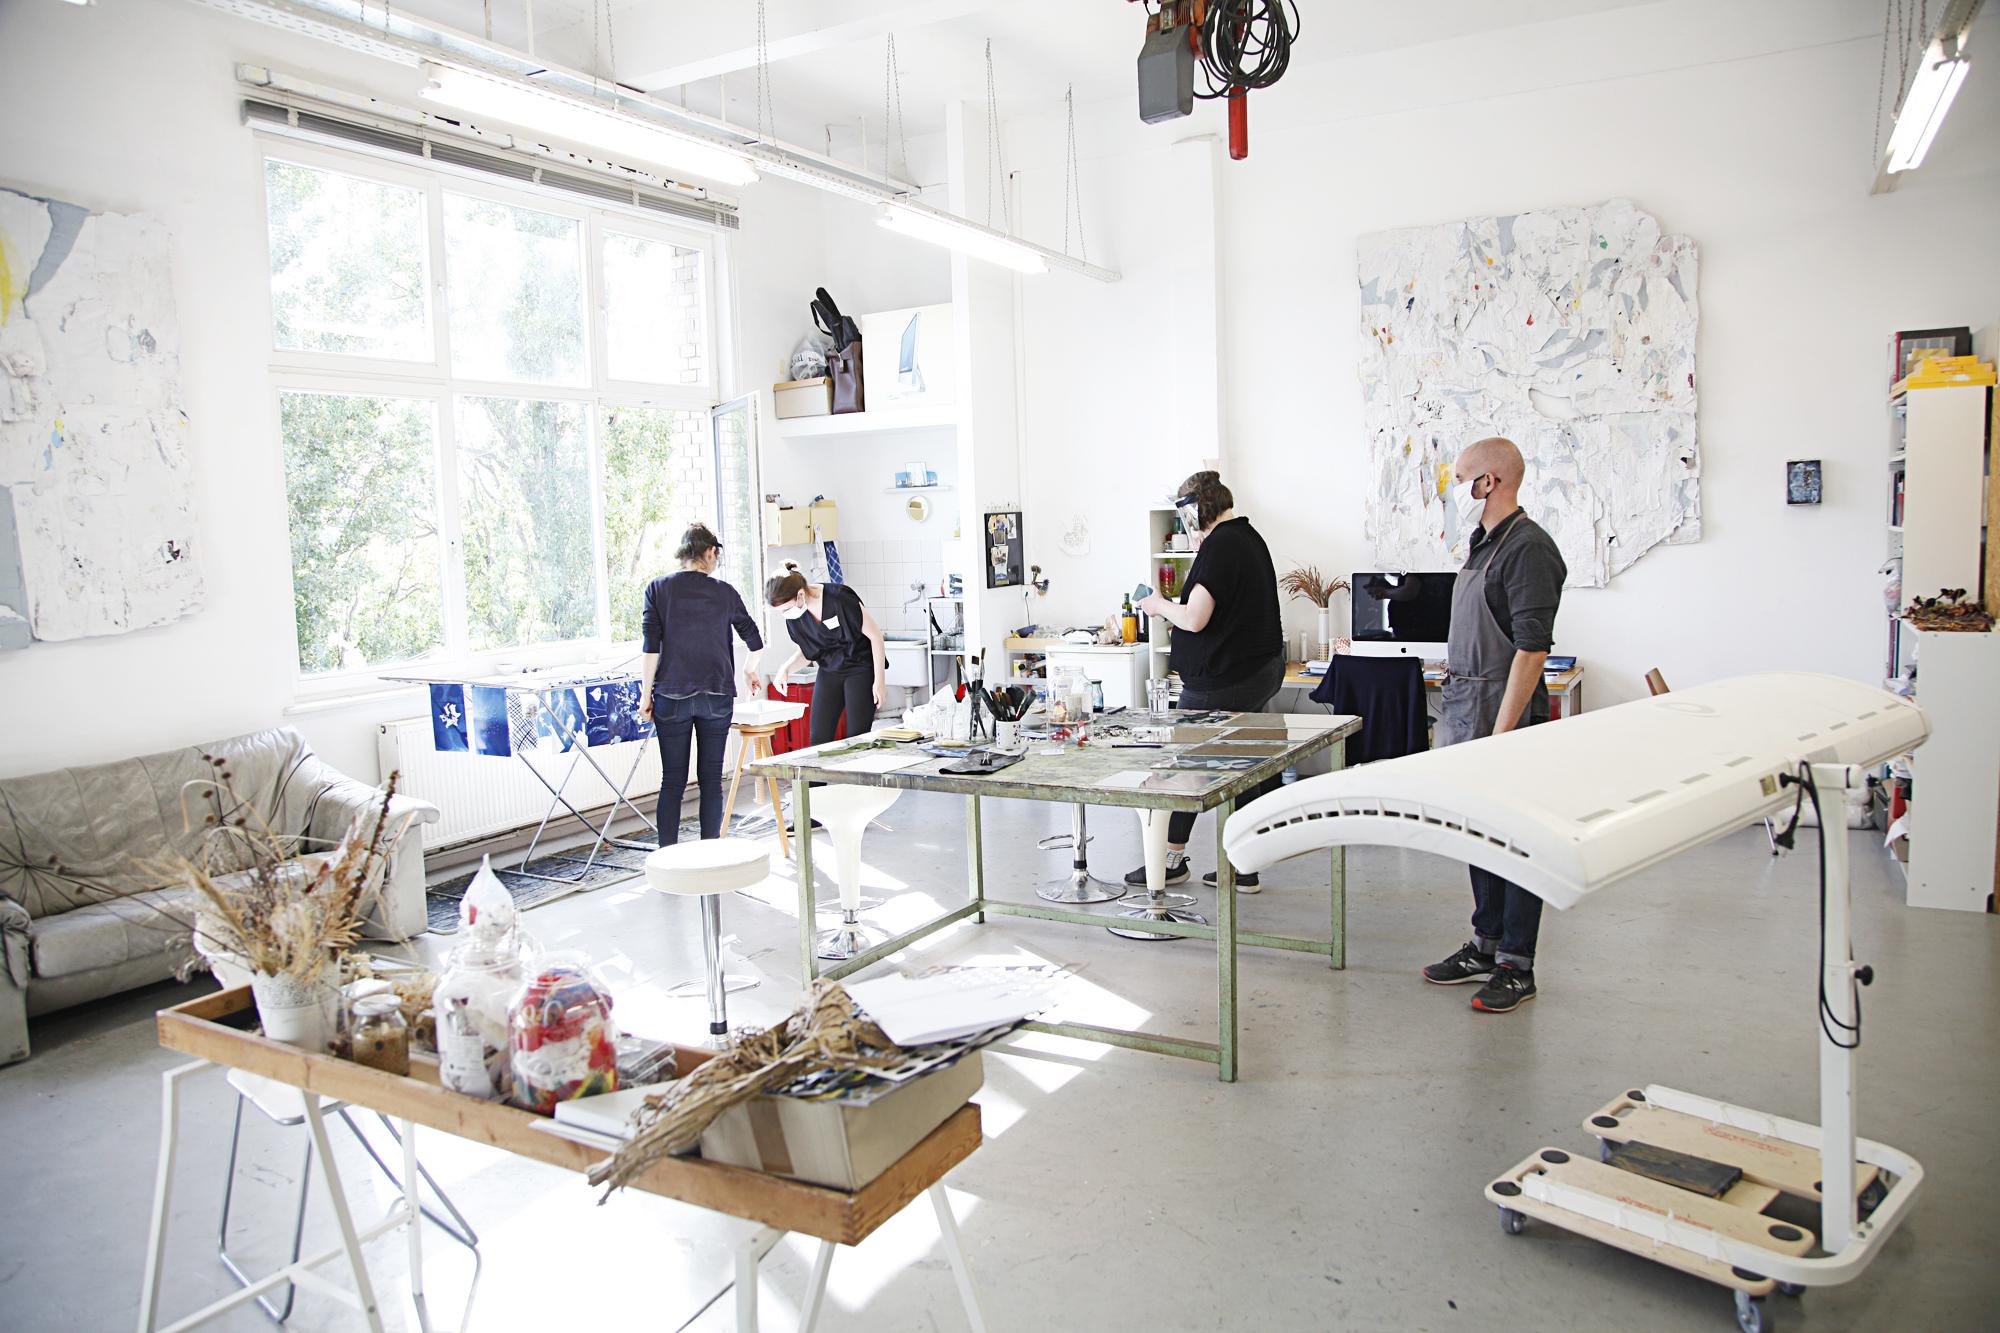 Blaues Glück – Cyanotype workshop with Kirsten Heuschen, Berlin